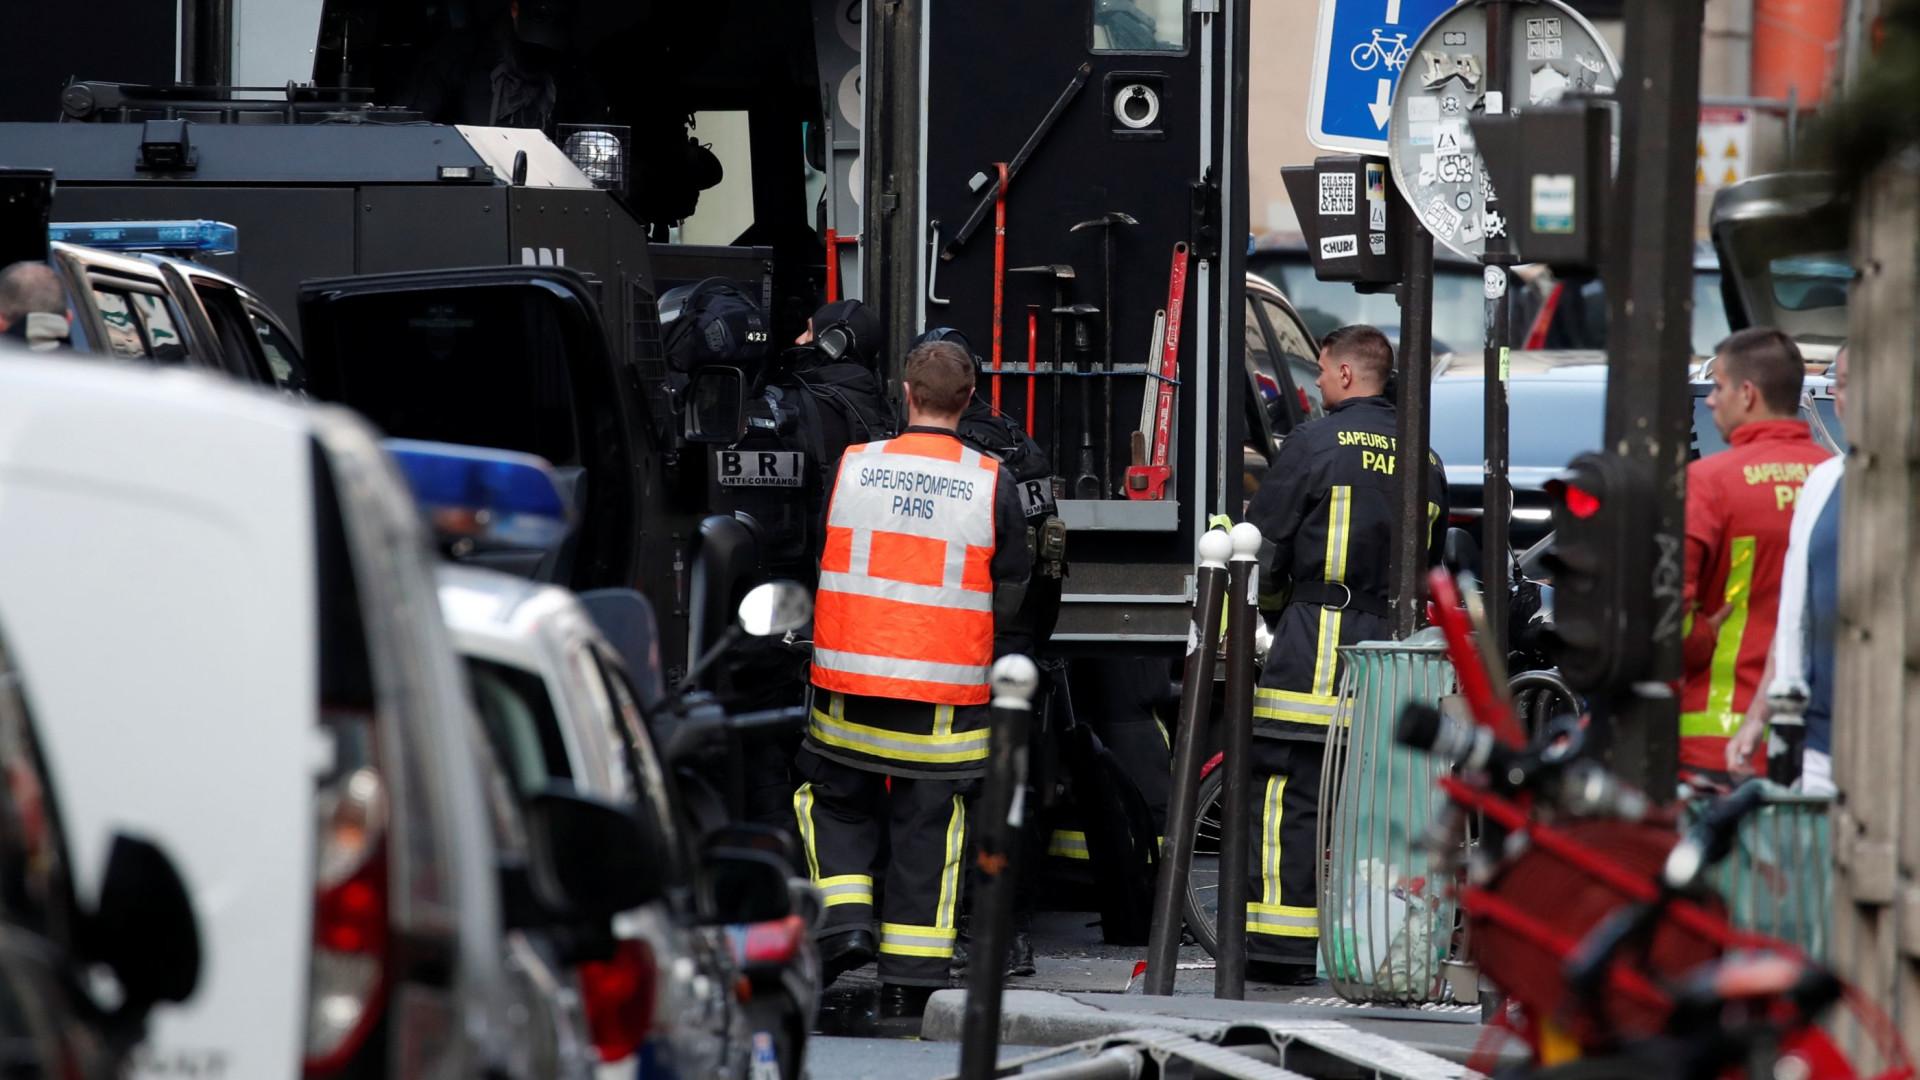 Paris: Sequestrador terá 26 anos e será de nacionalidade marroquina